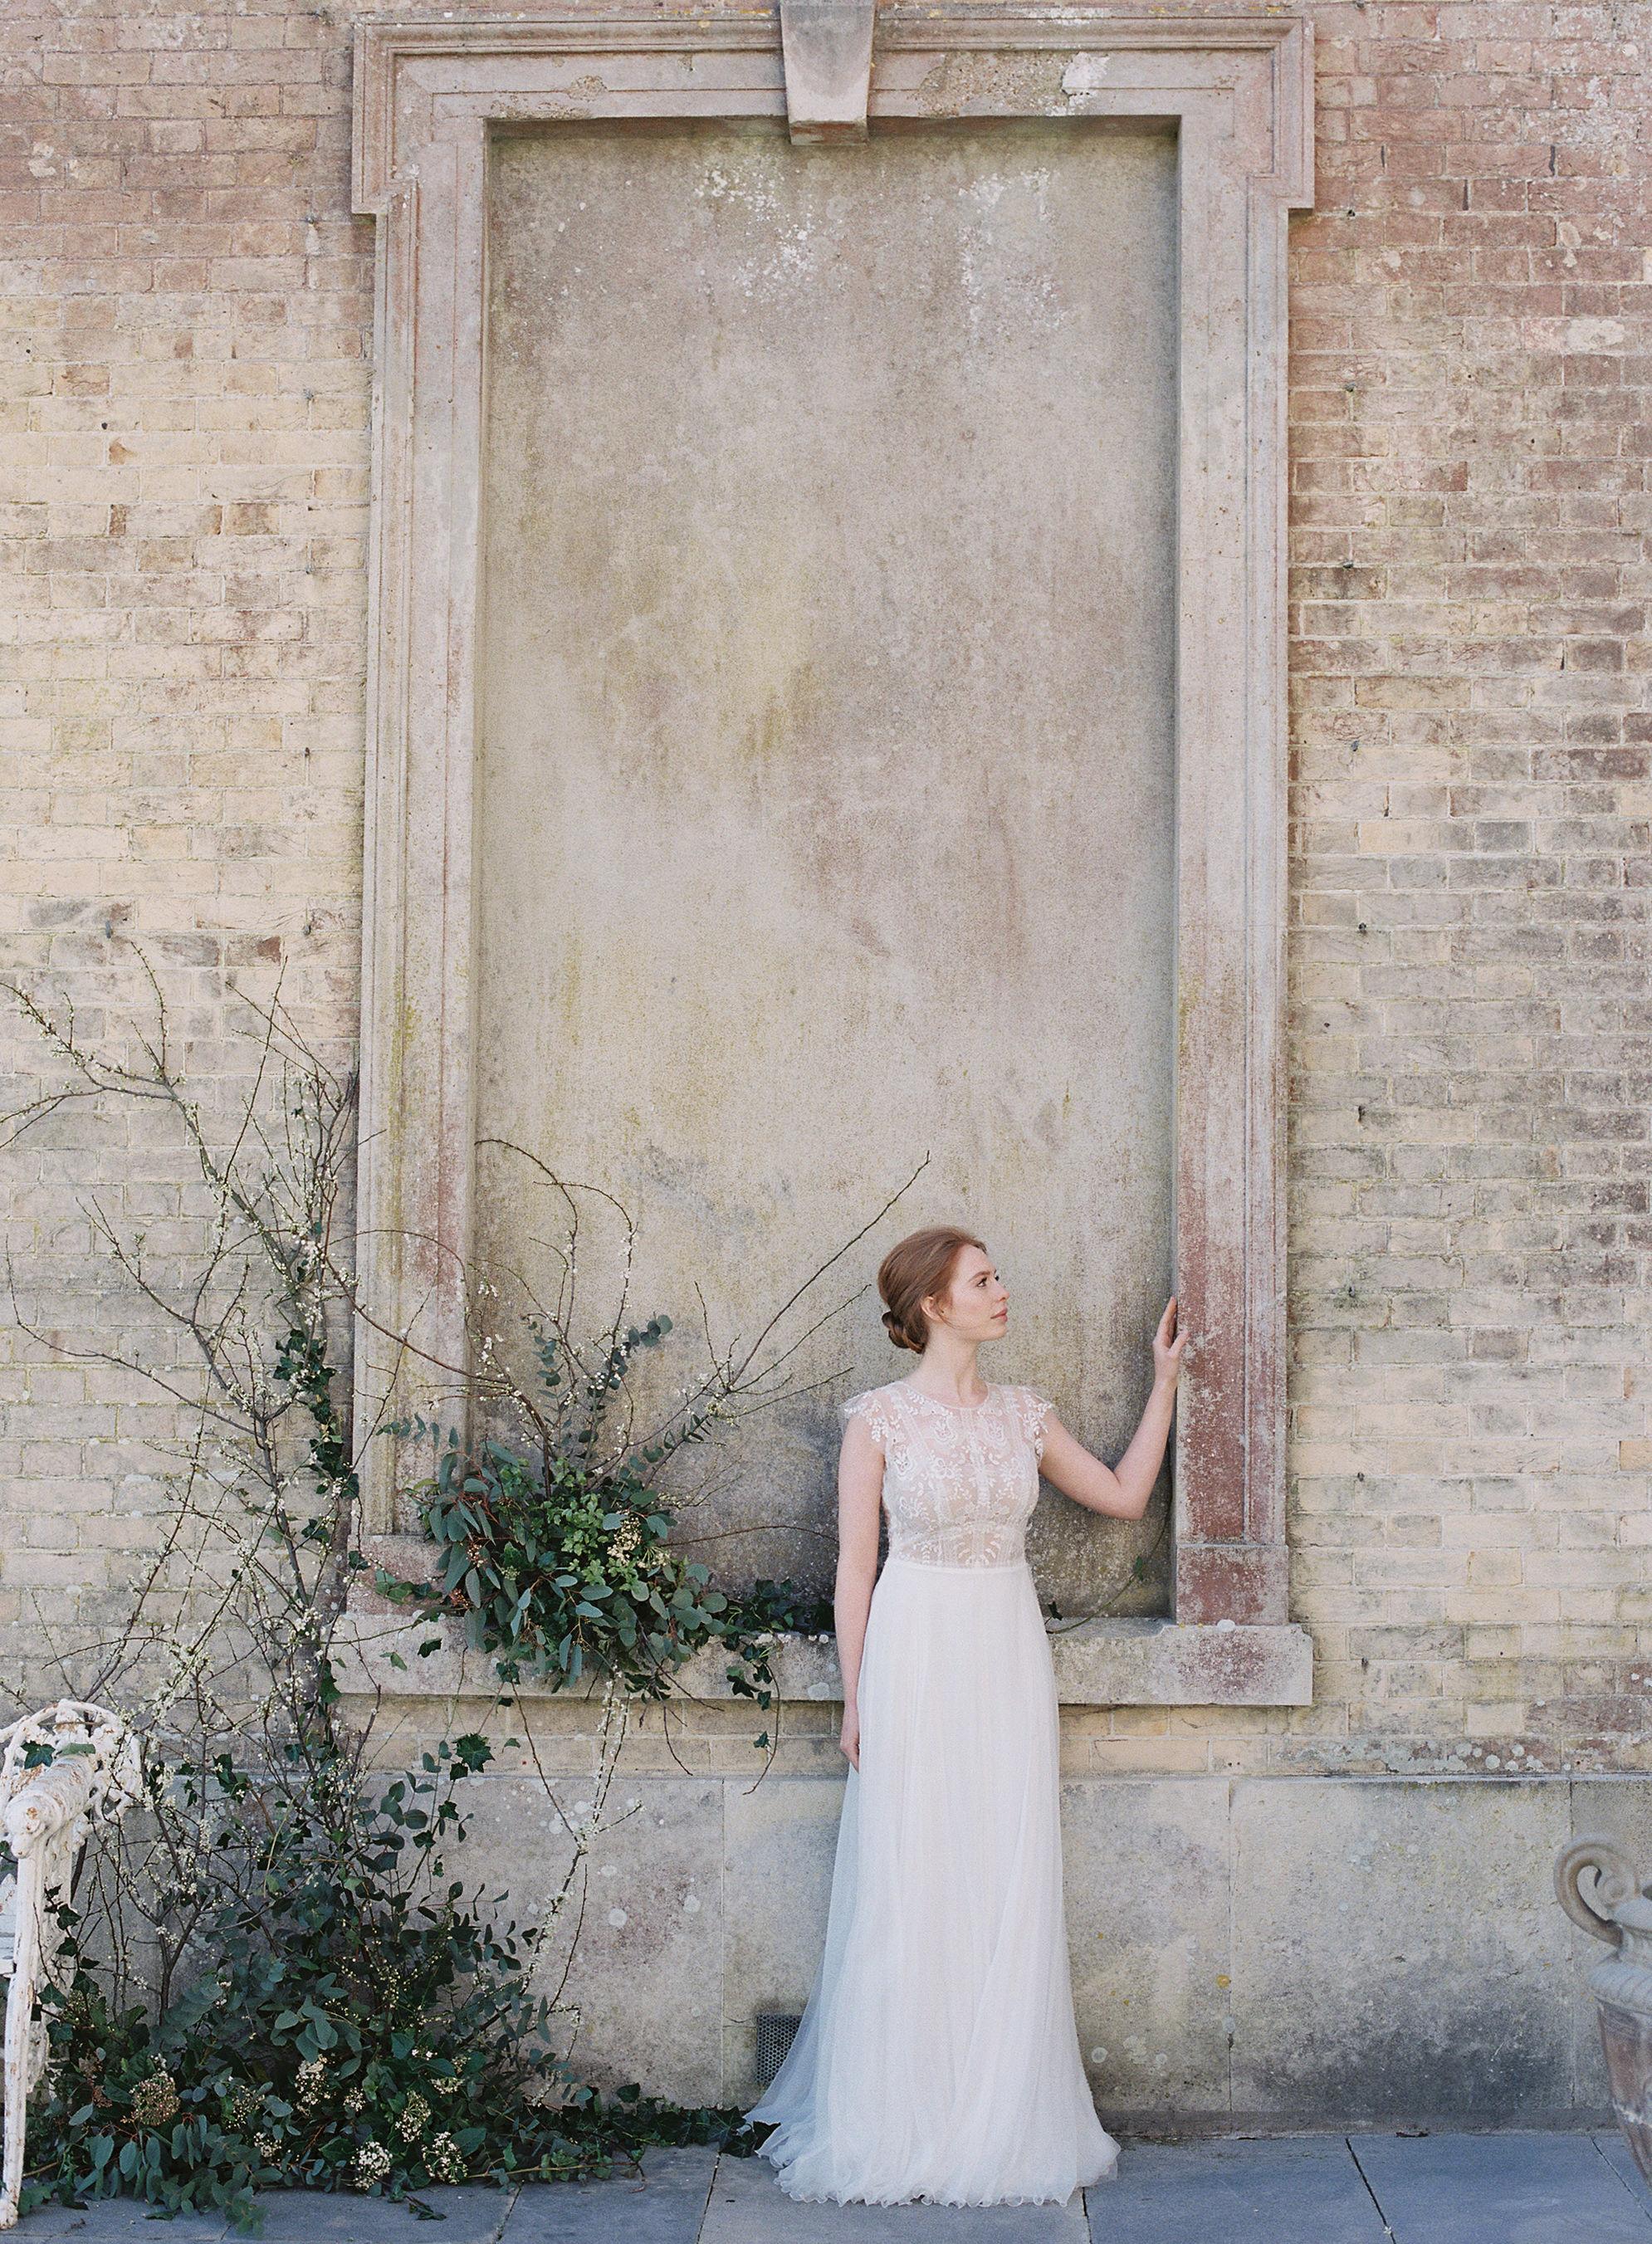 The Timeless Stylist-A Forgotten Love Story-Fine Art Wedding Editorial-Heirloom Wedding Styling 31.jpg